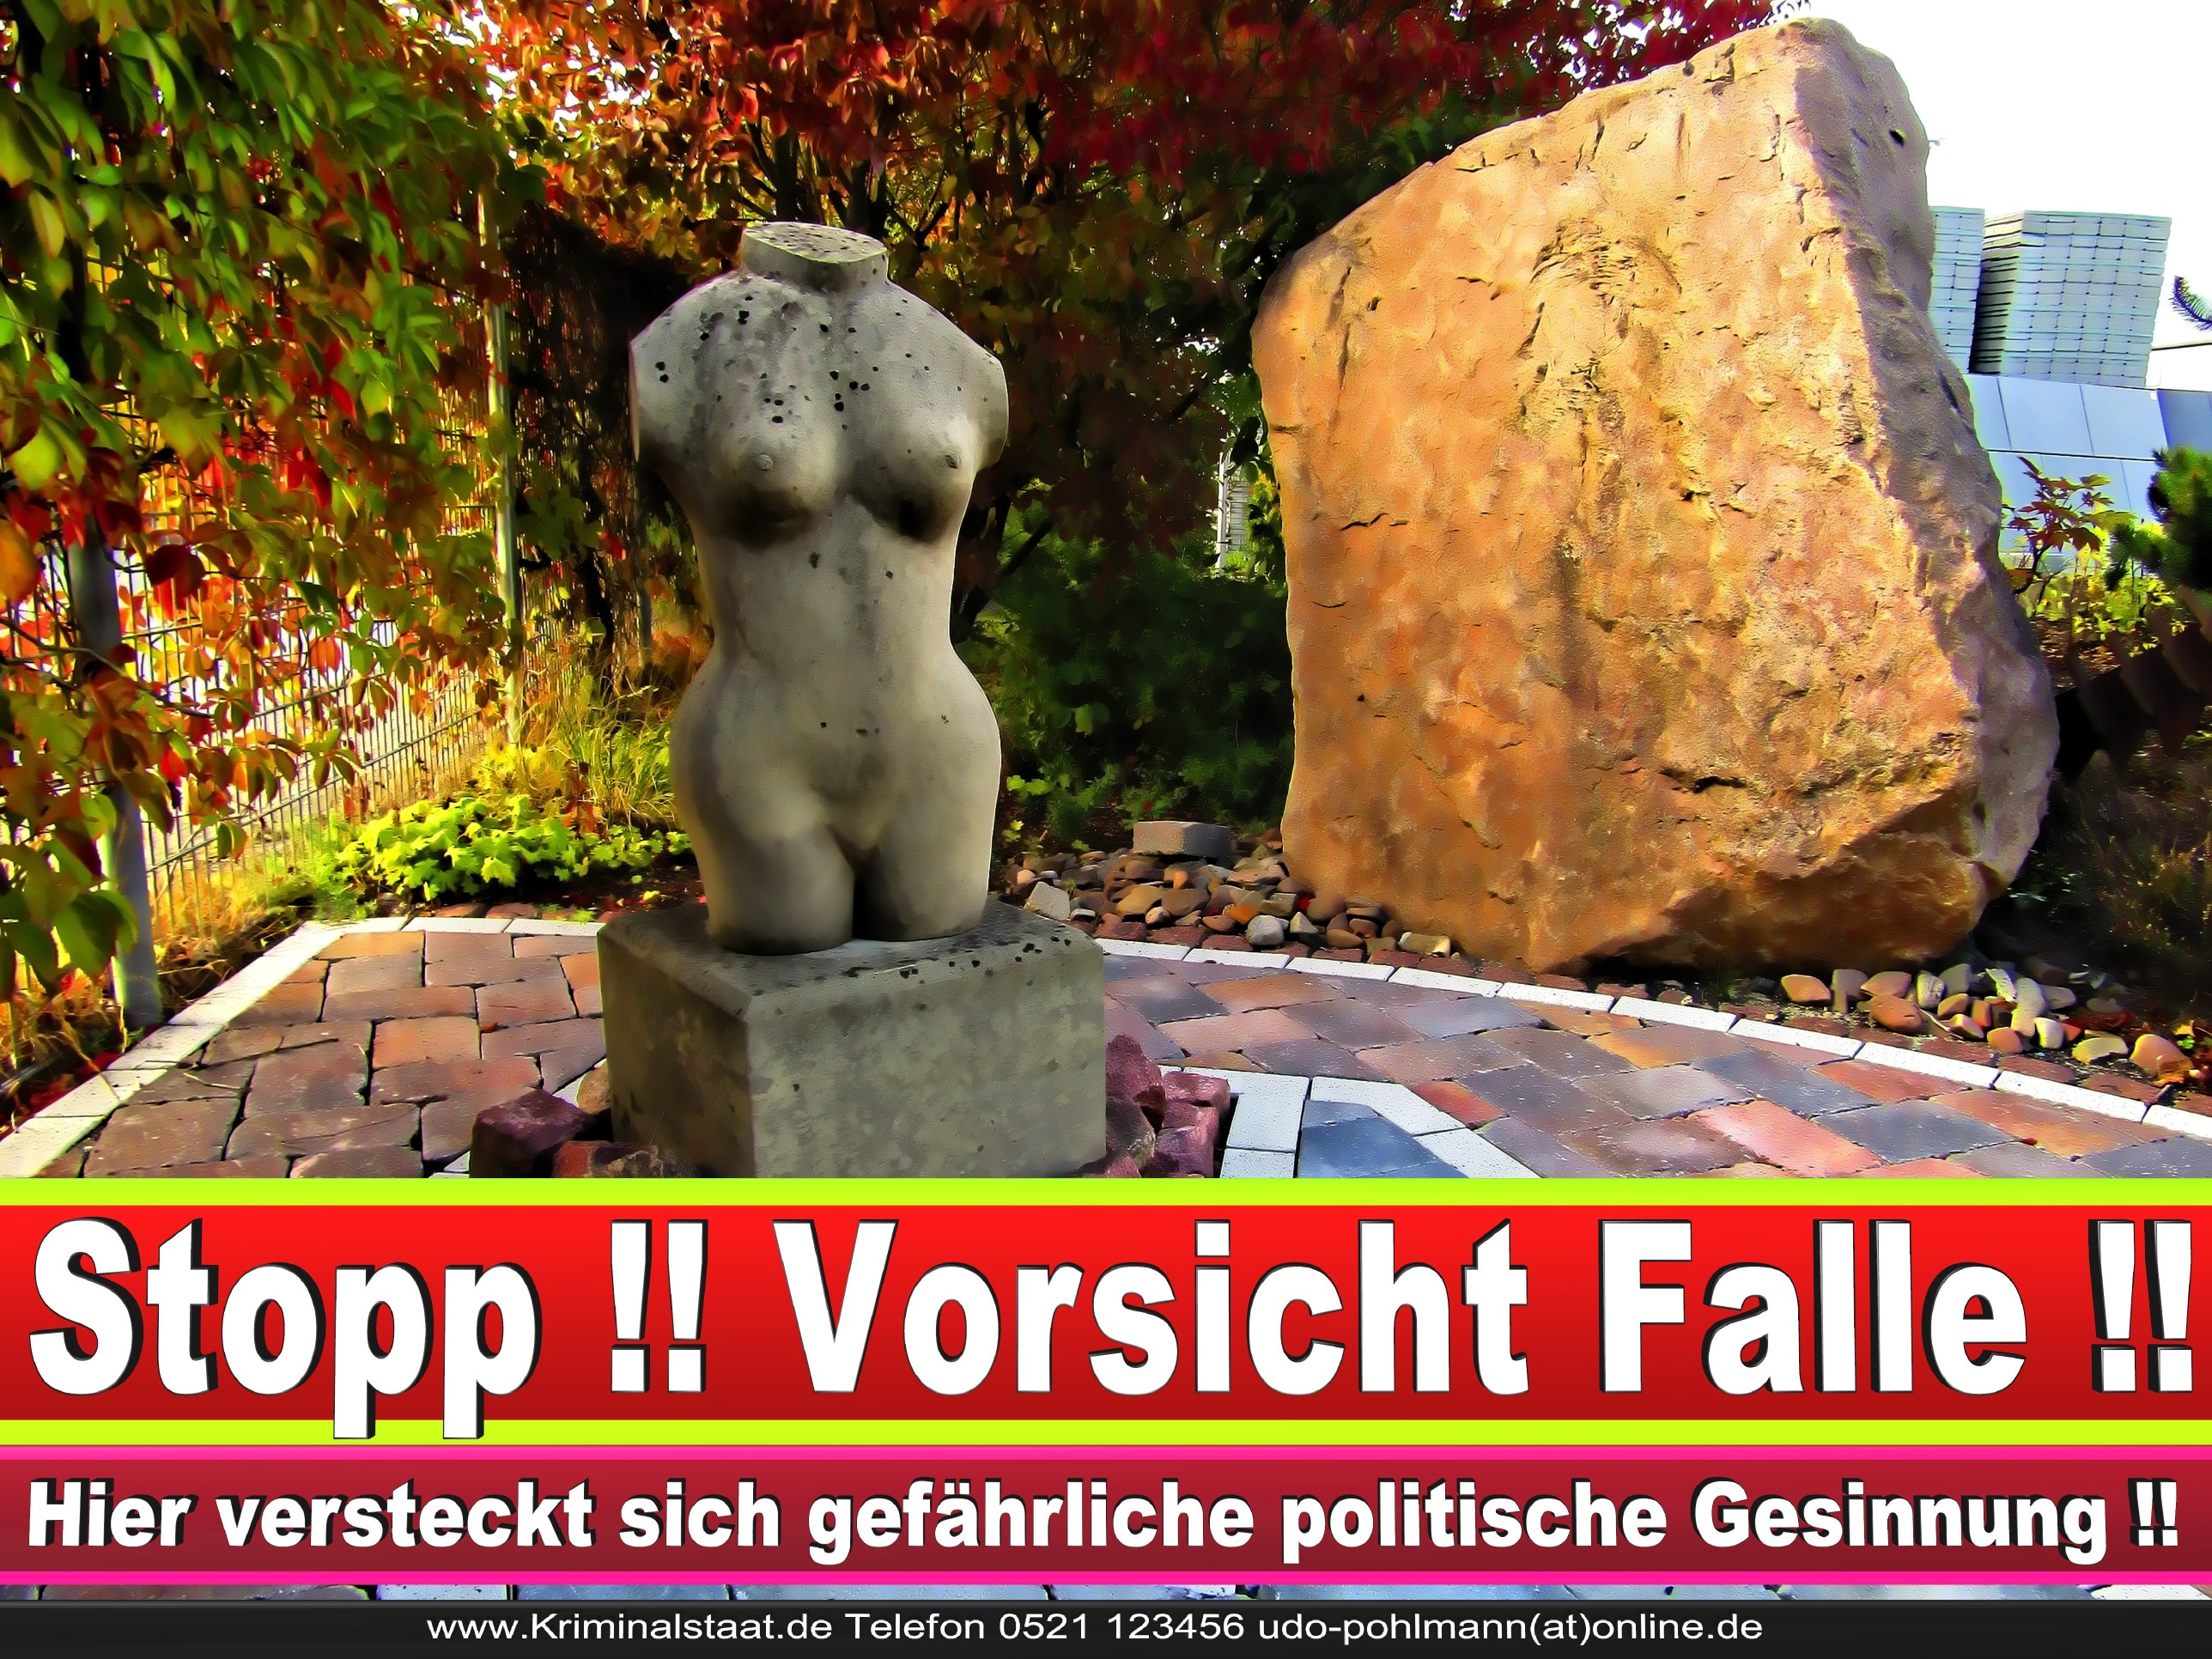 BETONWERK MÜNSTERMANN CDU GÜTERSLOH 2 LANDTAGSWAHL BUNDESTAGSWAHL BÜRGERMEISTERWAHL